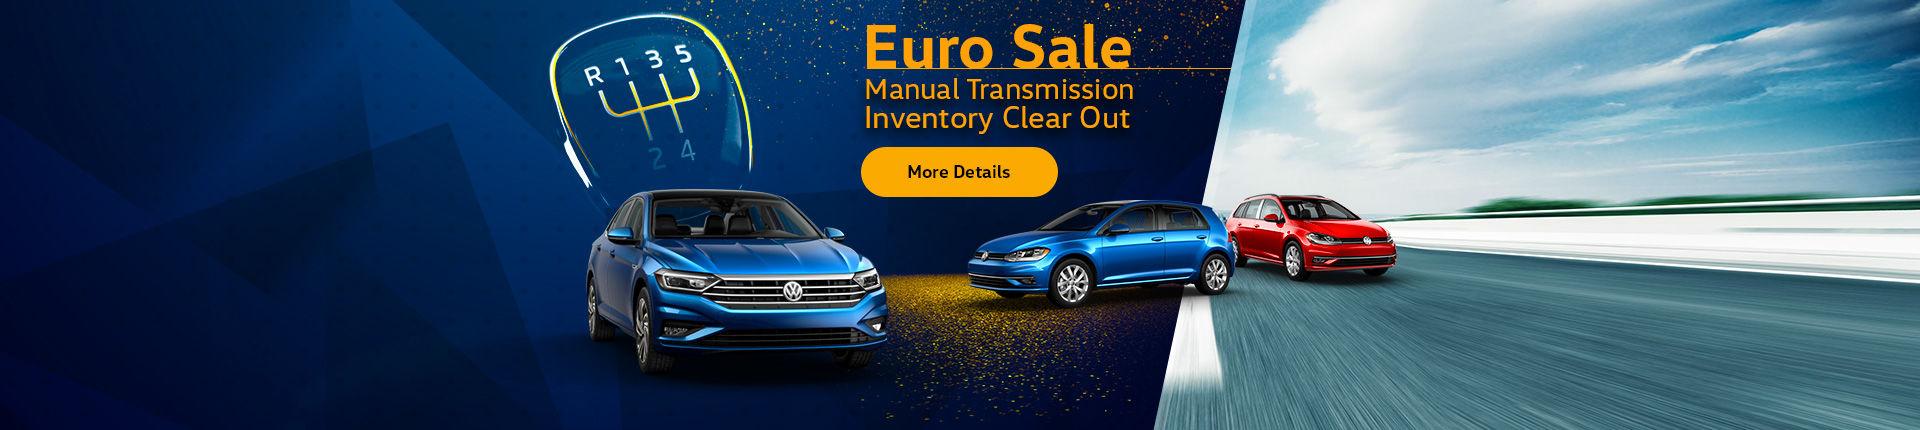 Euro Sale